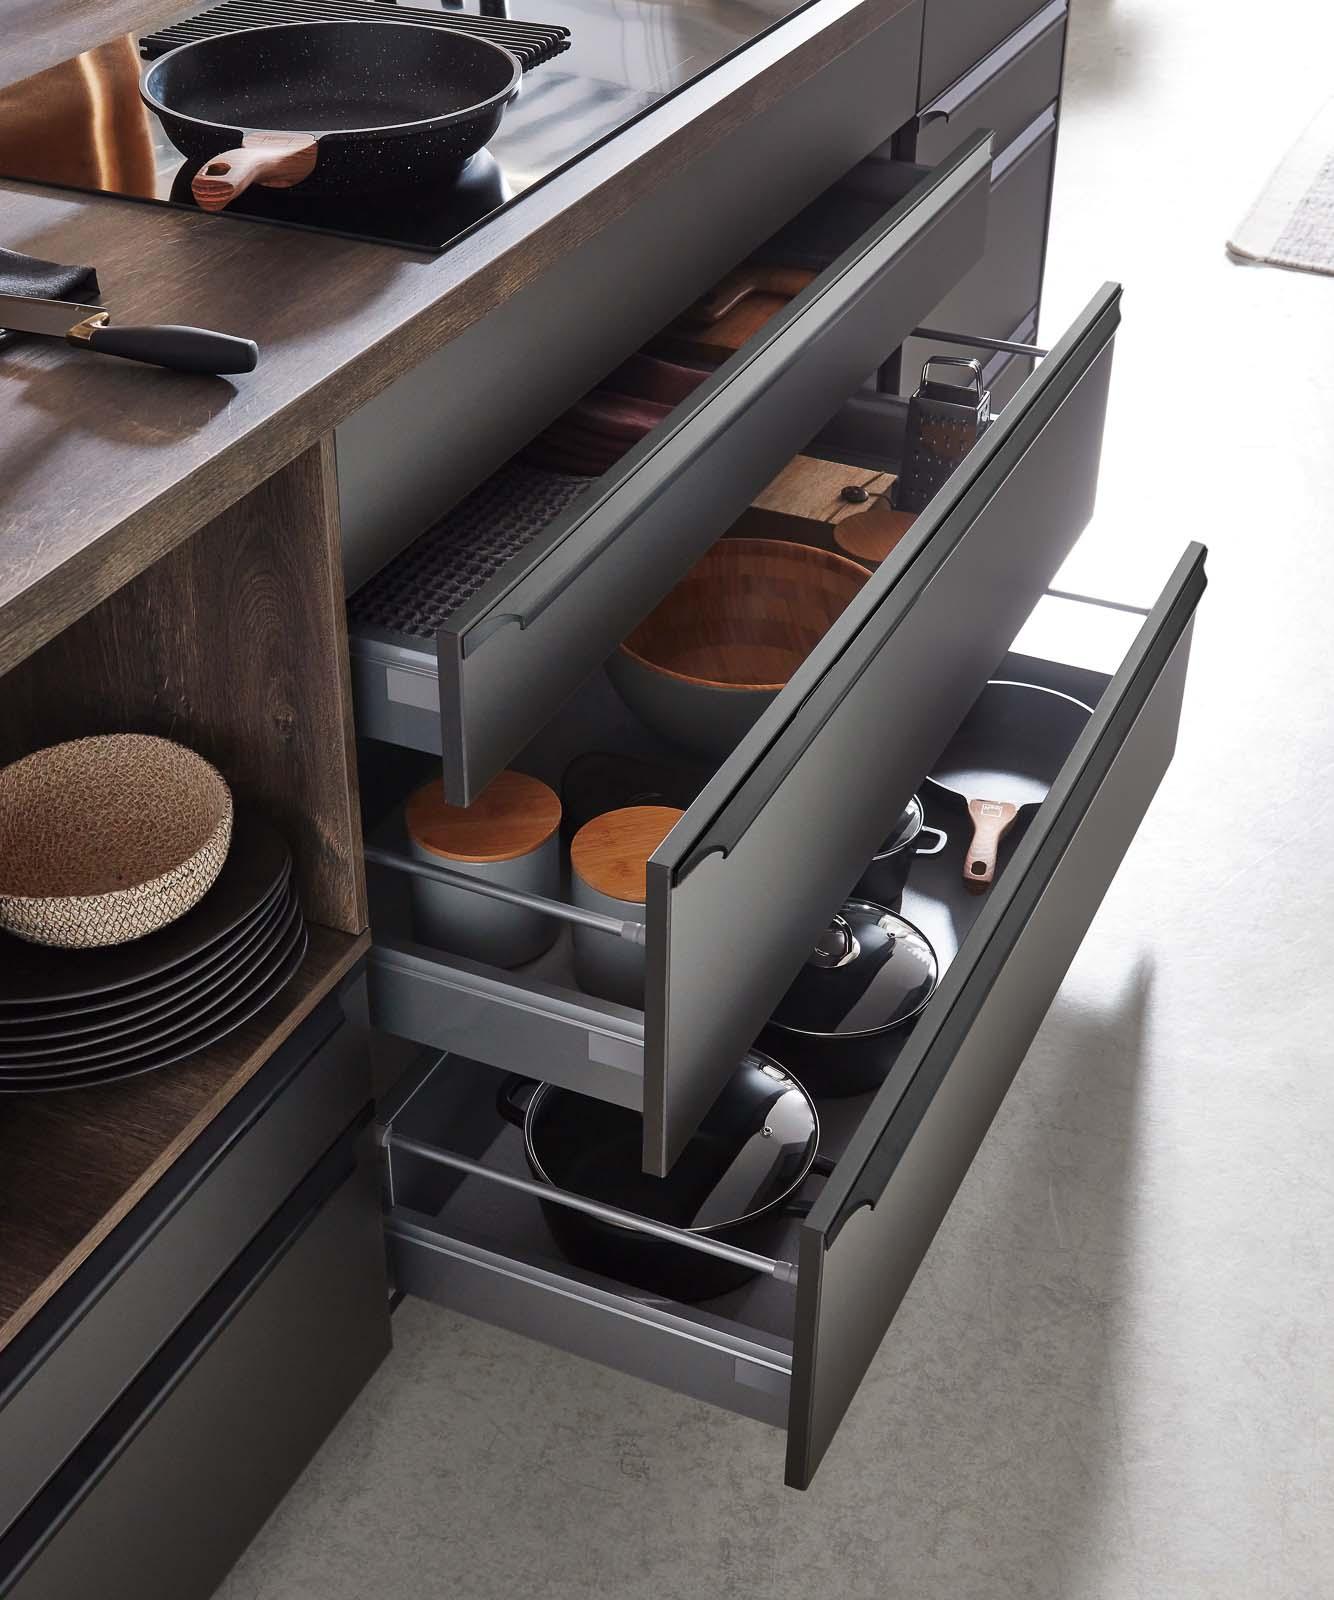 Nobilia Küchen - Modell Artis - 937